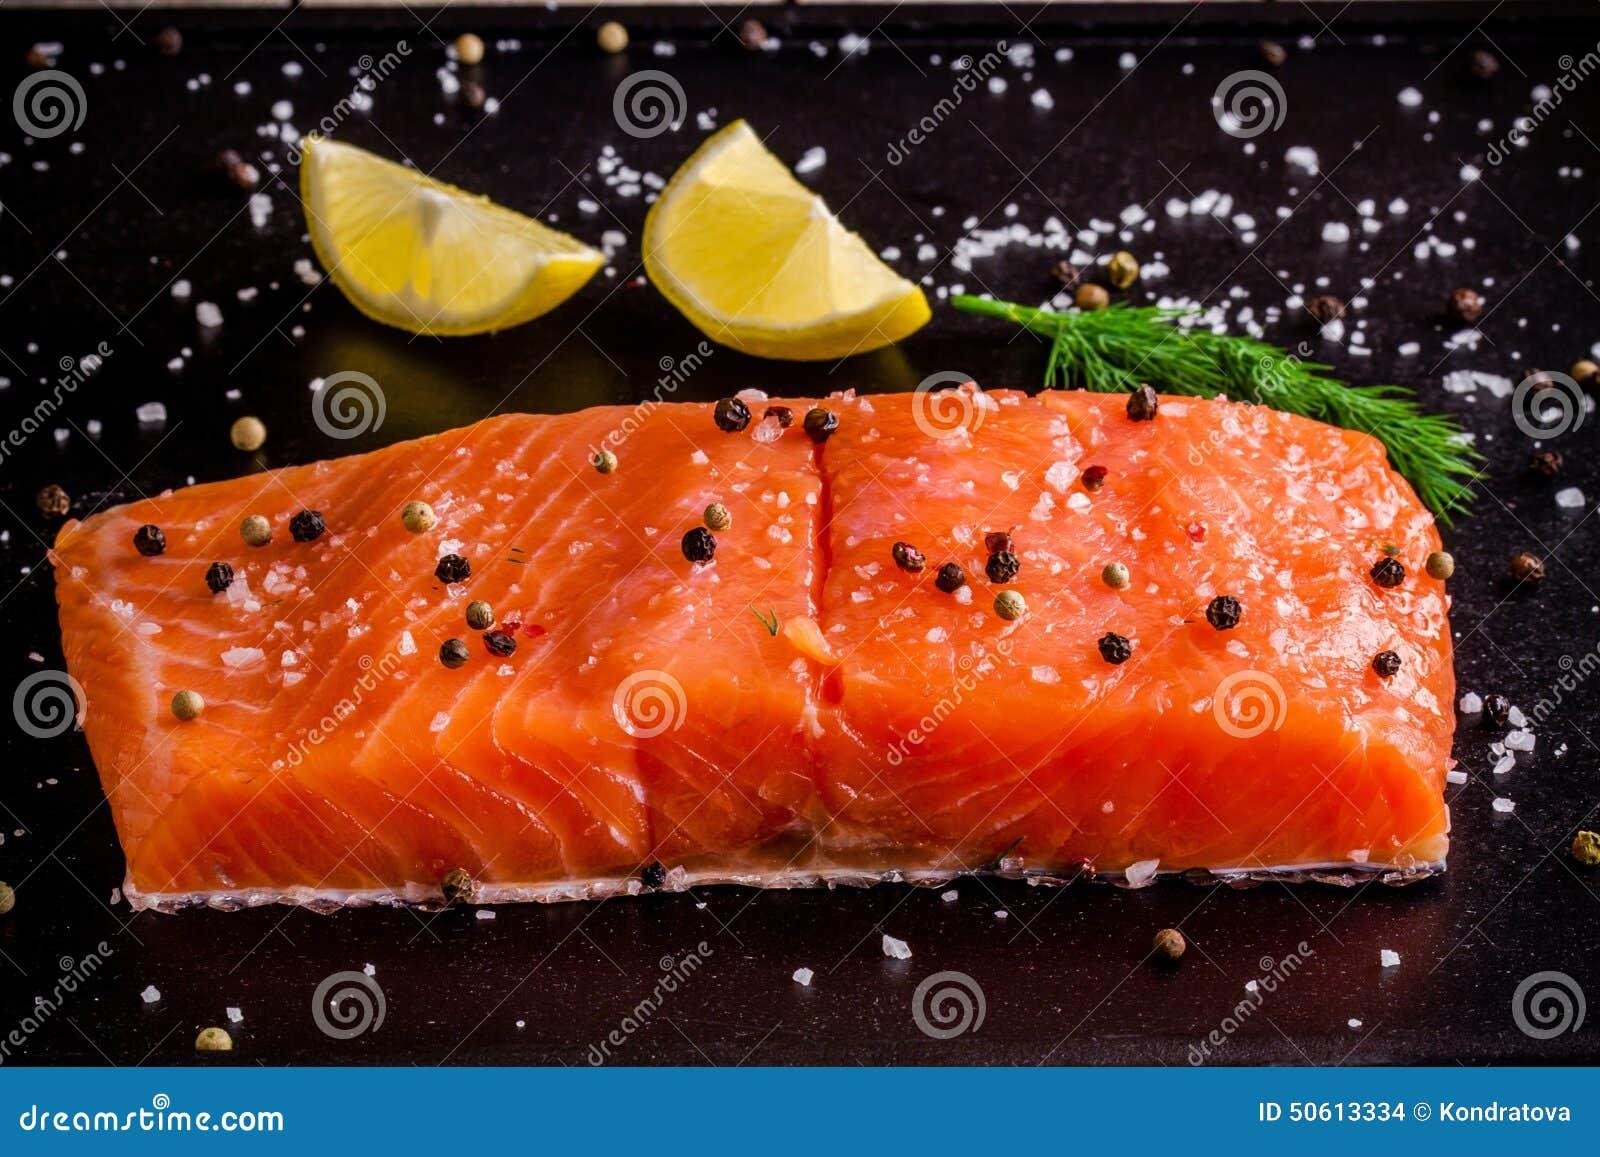 Fresh Salmon Fillet With Lemon, Peppr And Sea Salt Stock Photo ...